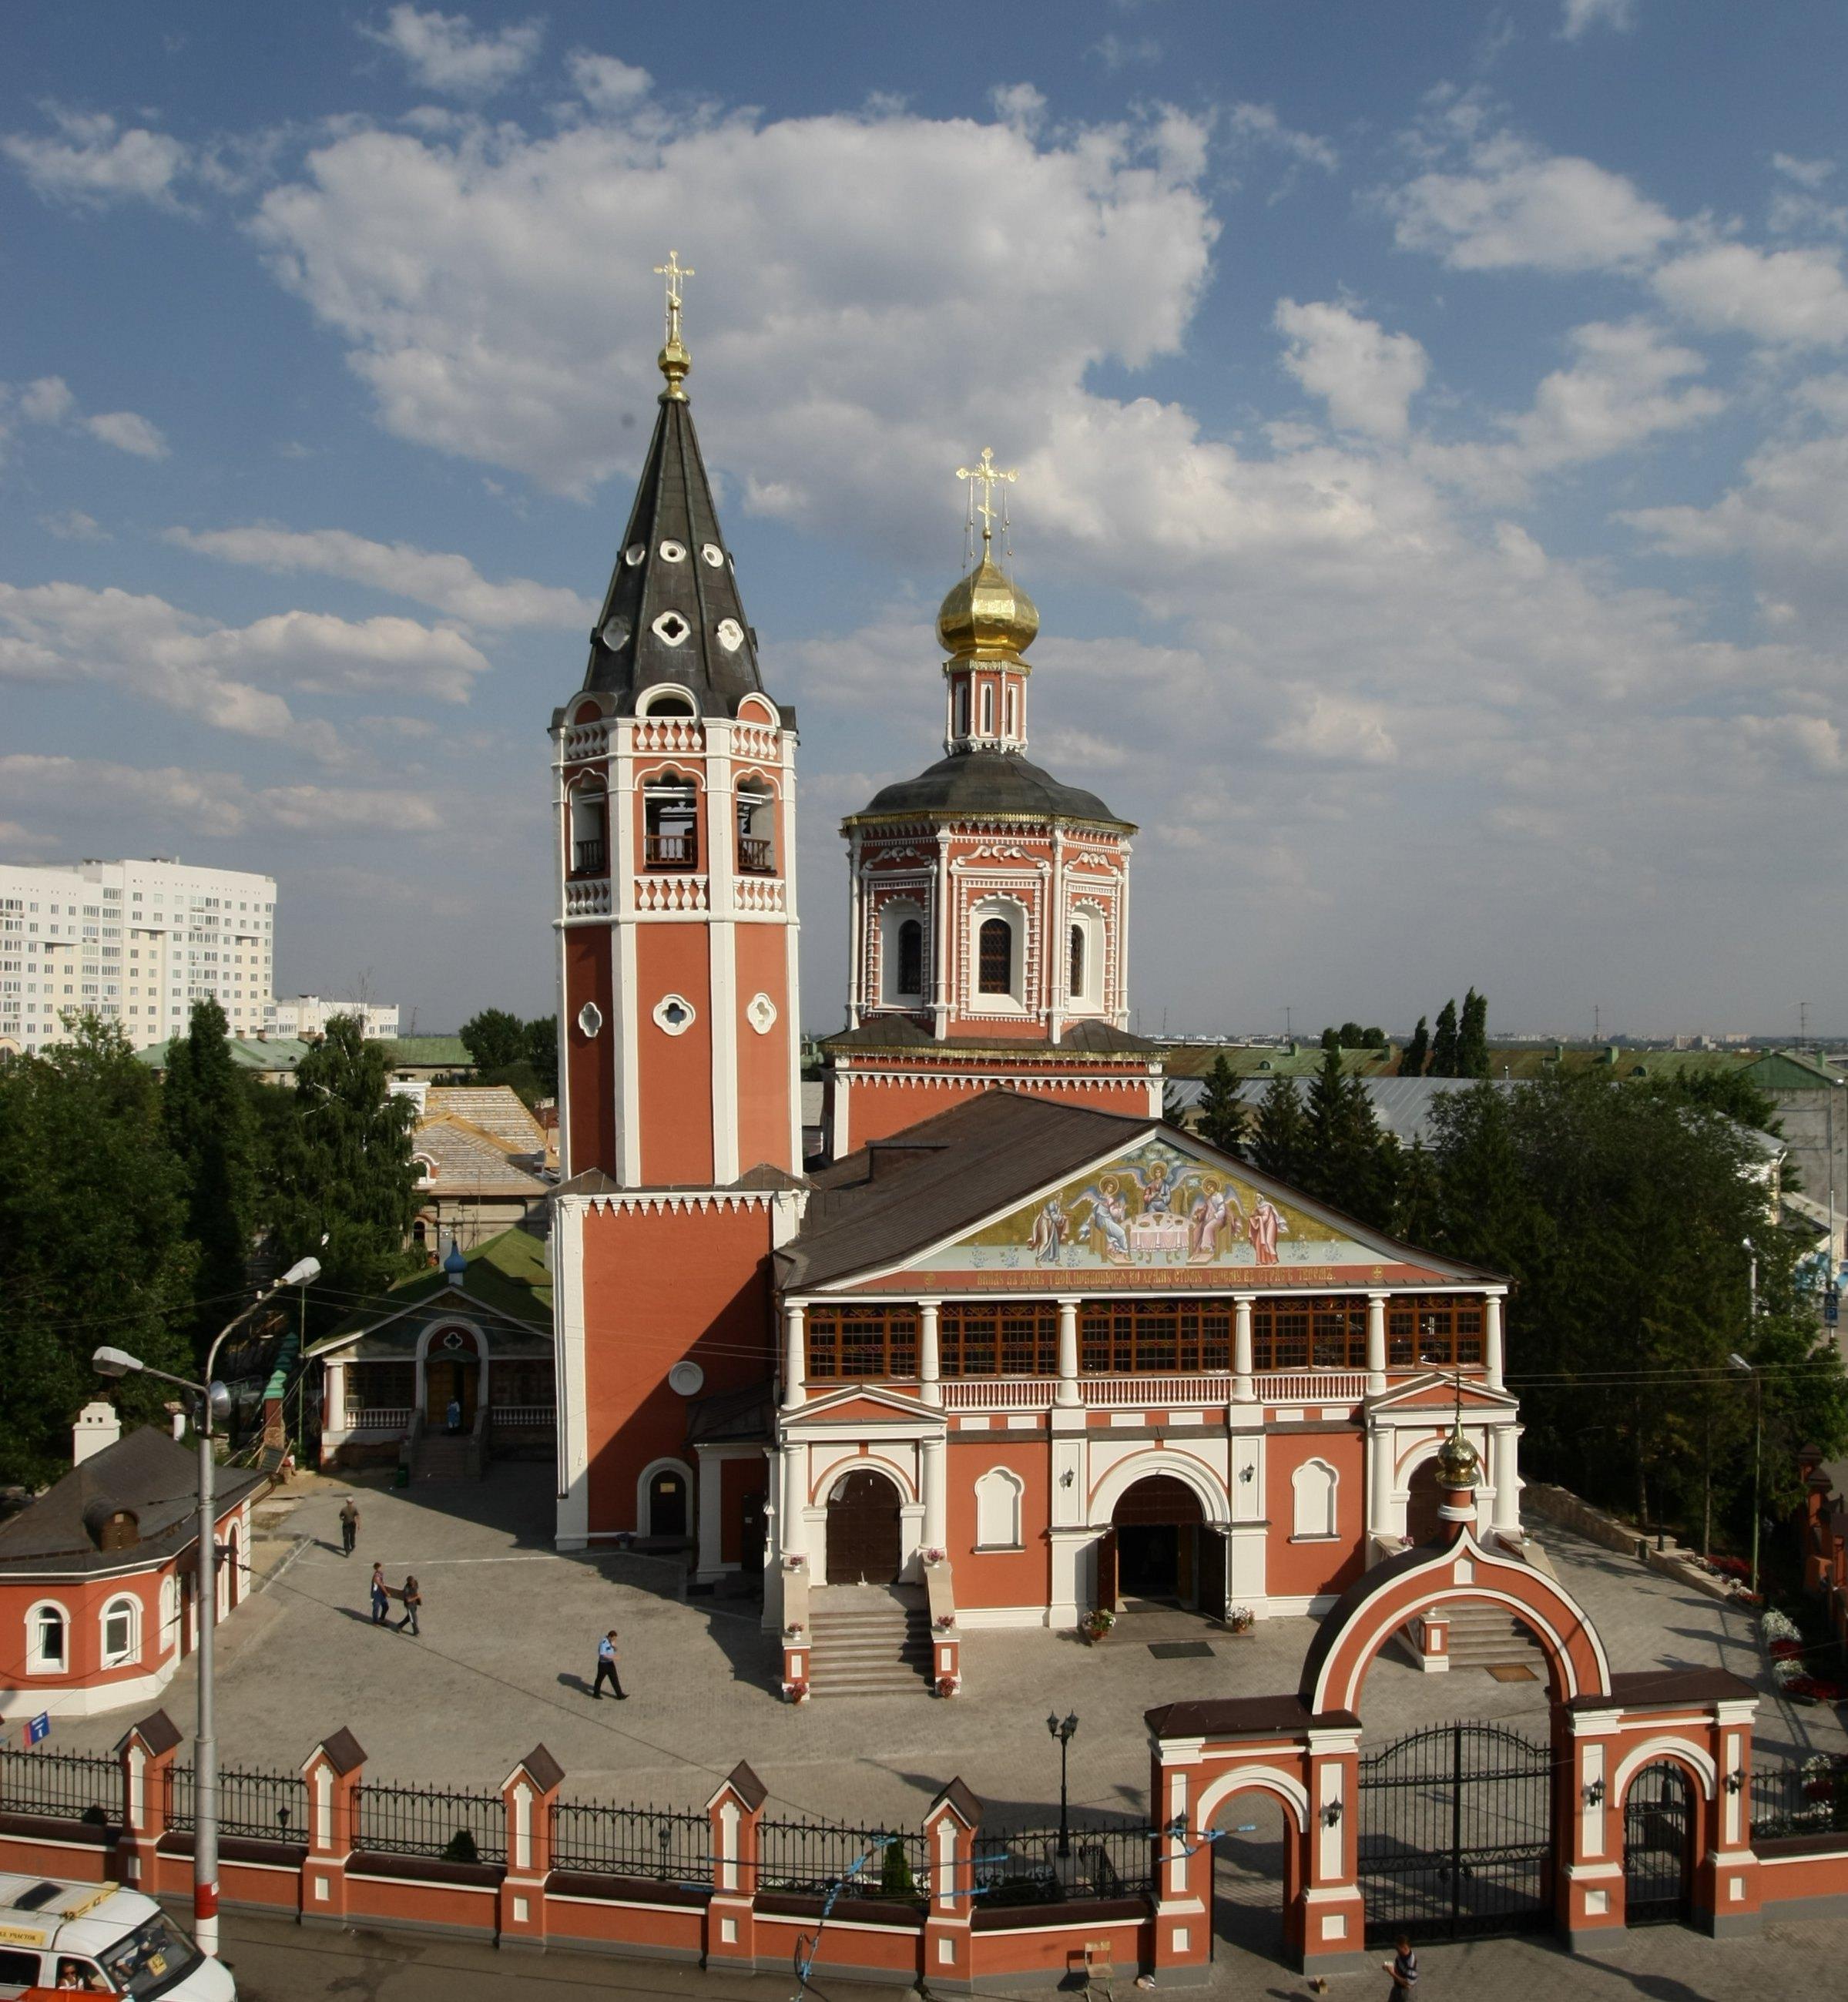 http://upload.wikimedia.org/wikipedia/commons/a/aa/Свято-Троицкий_собор_(Саратов).jpg